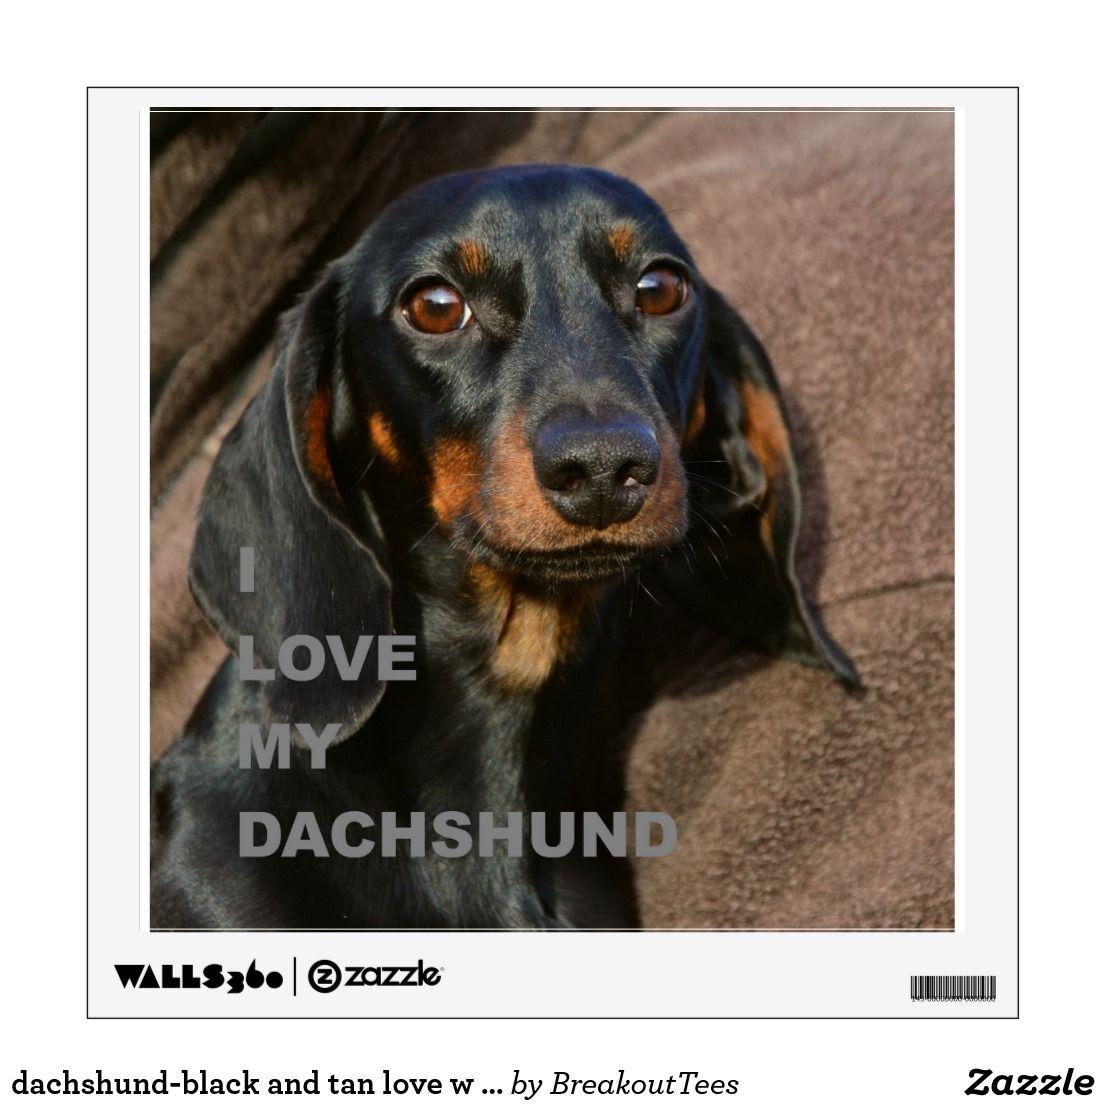 Dachshund Black And Tan Love W Pic Wall Sticker Zazzle Com With